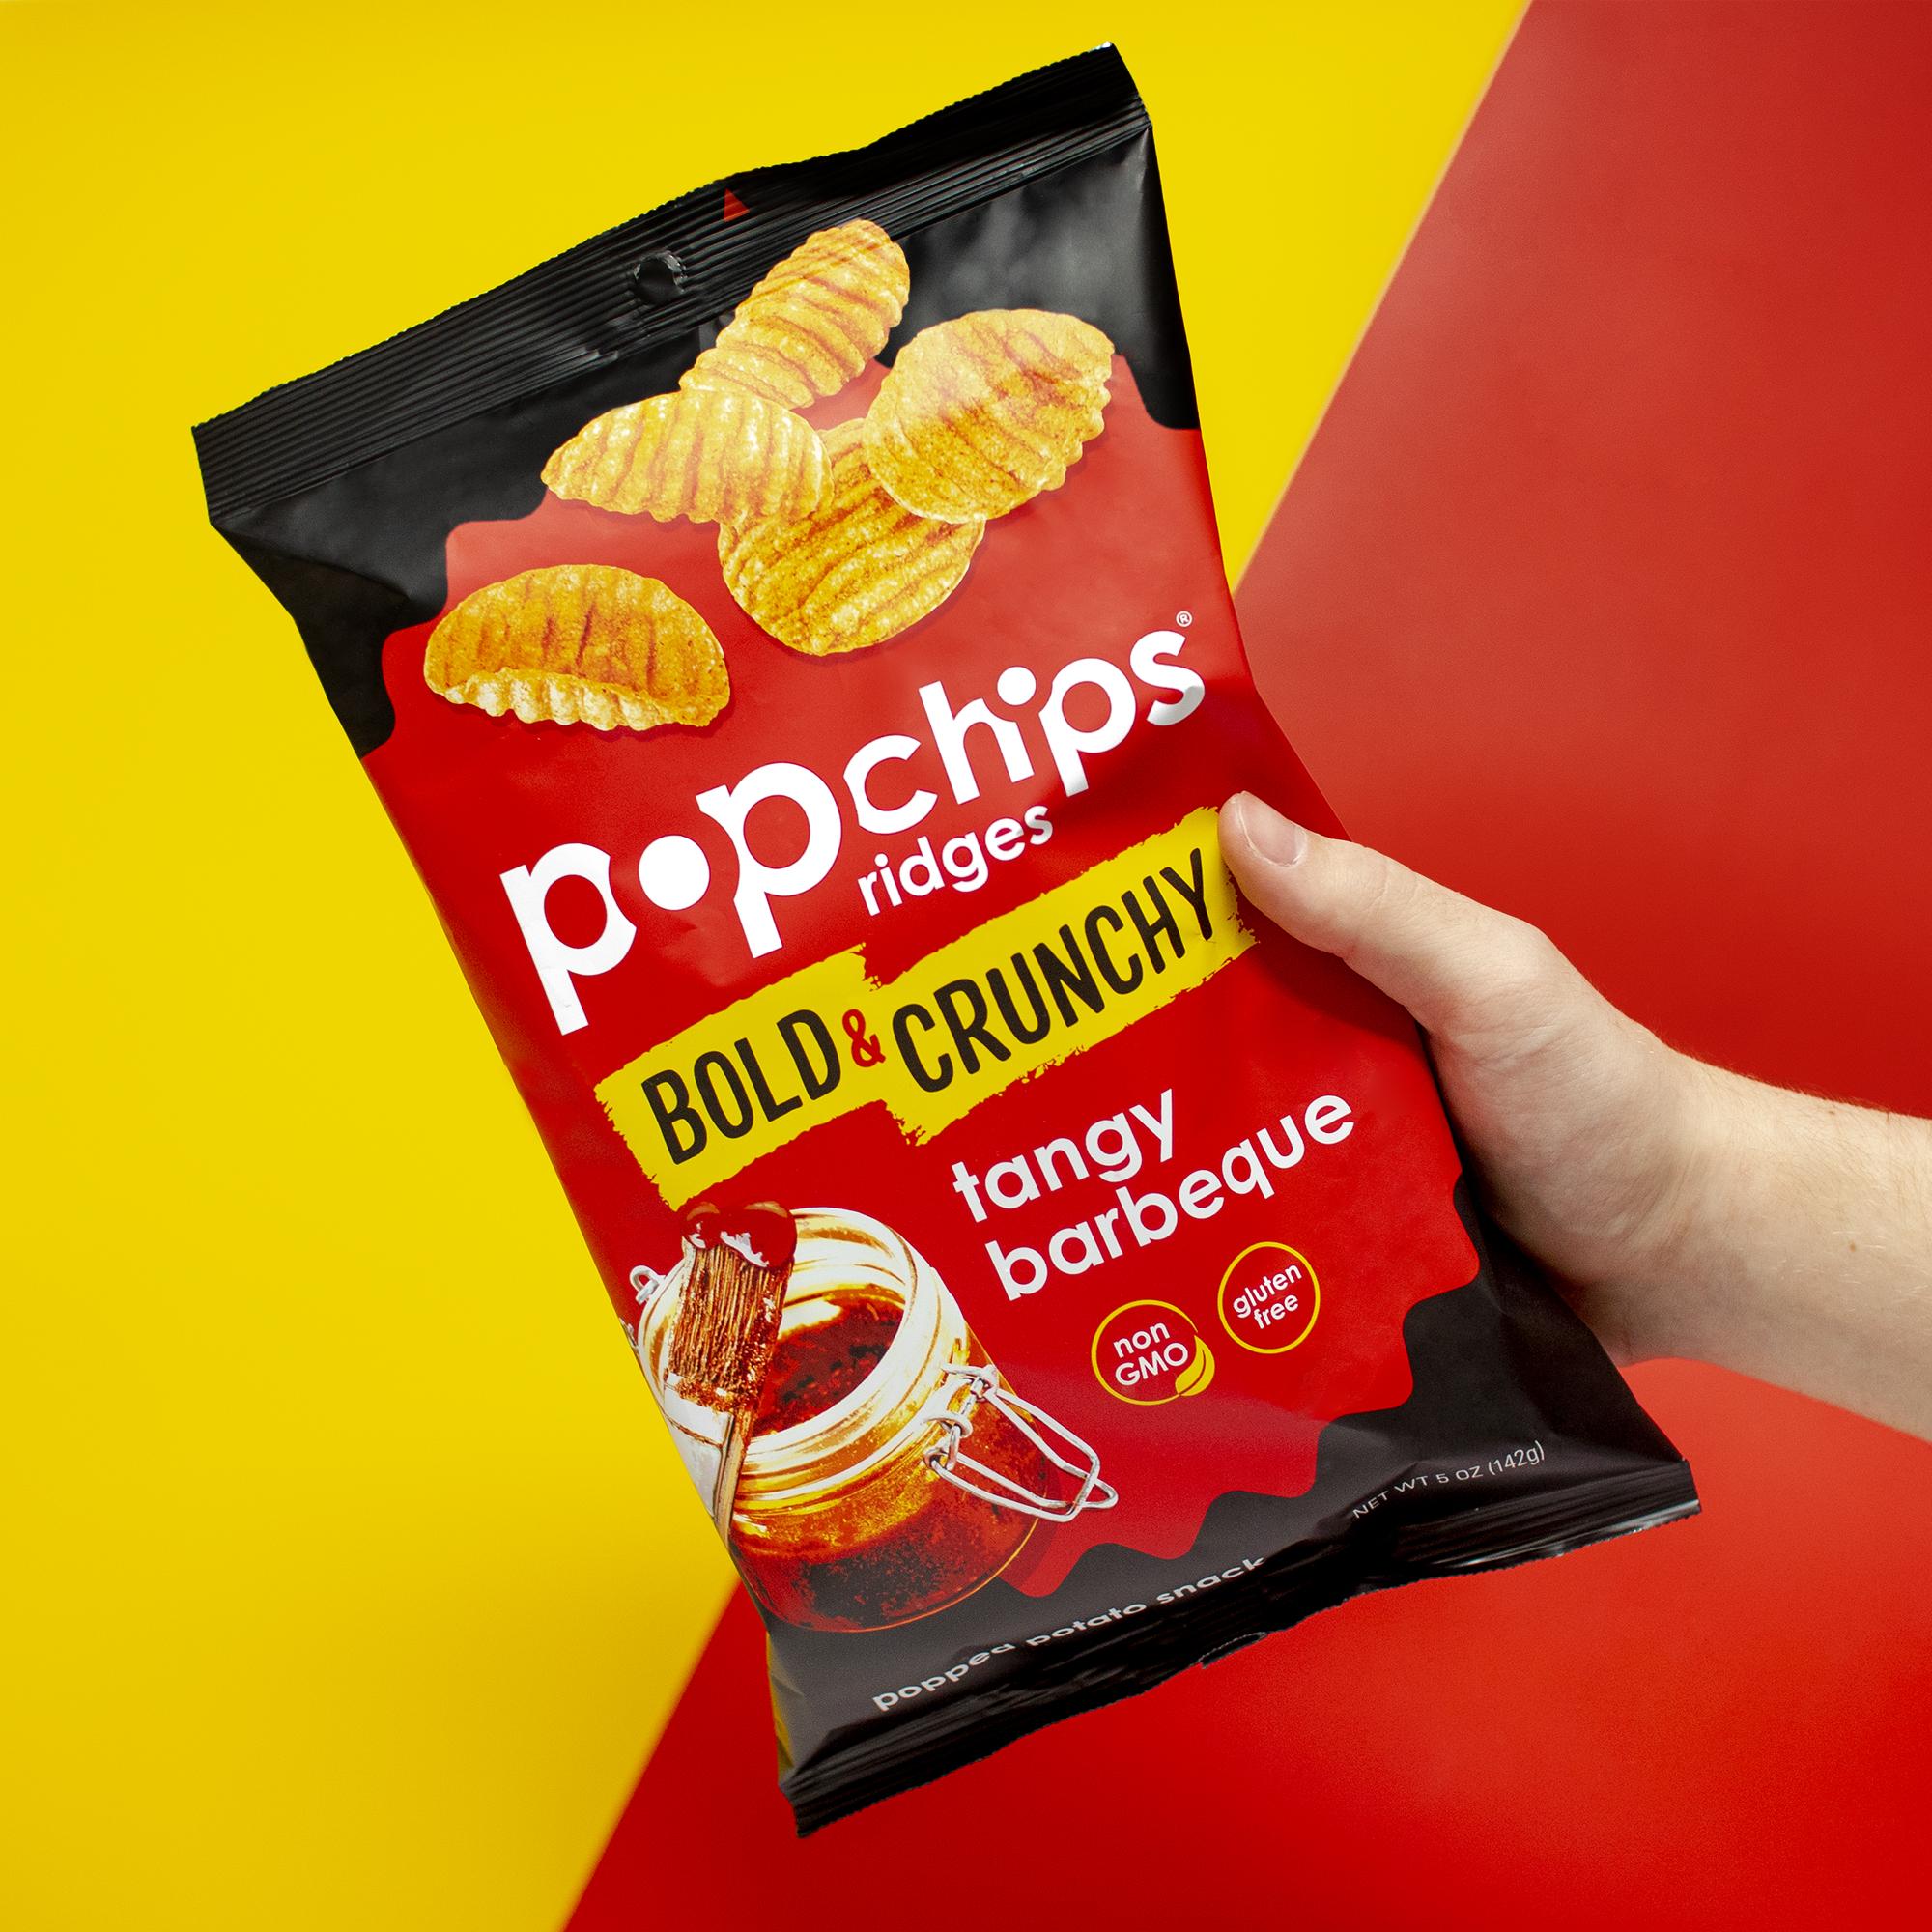 Popchips-Post-Tangy-BBQ.jpg